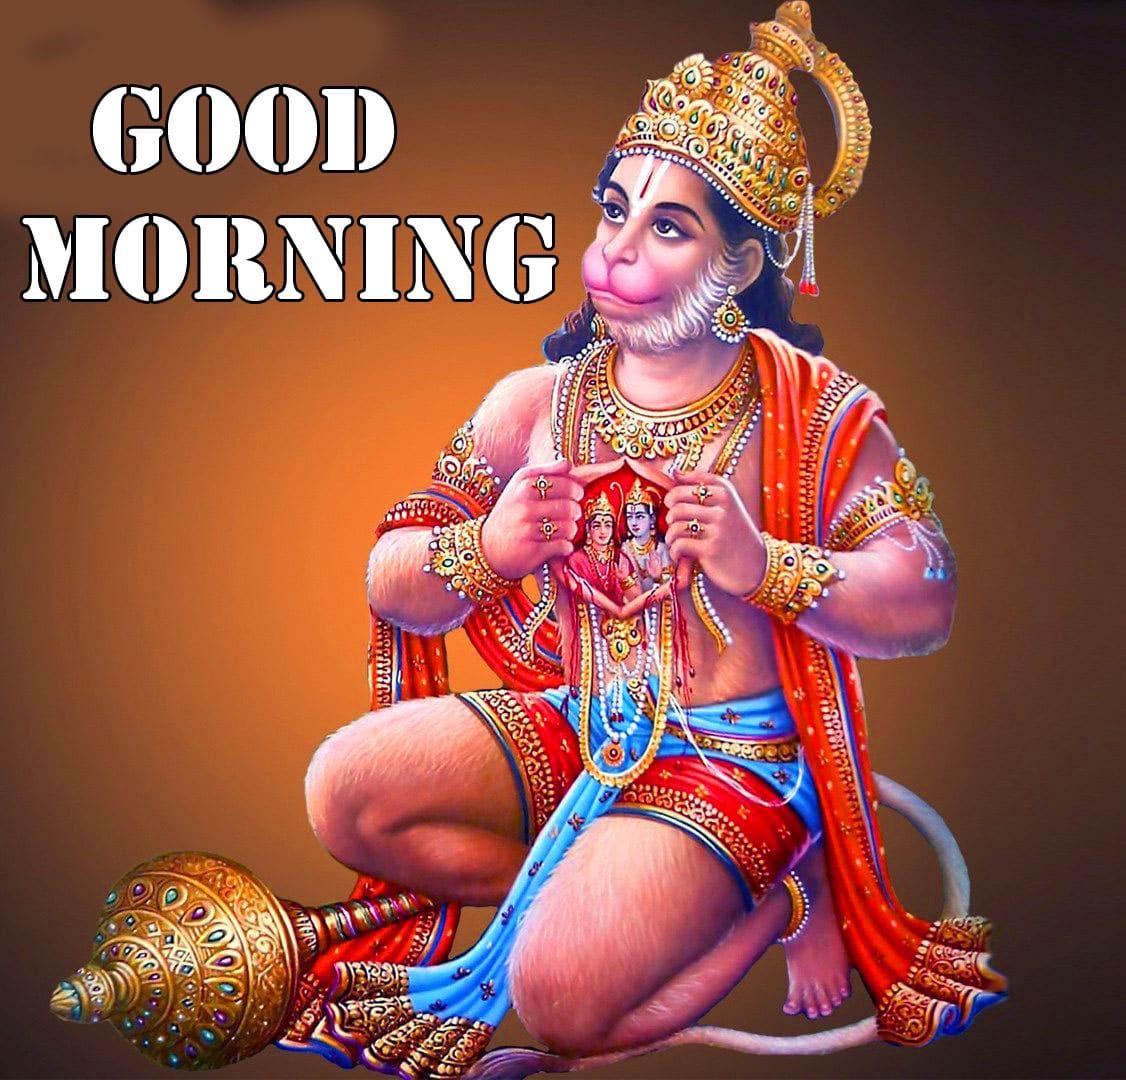 Hanuman Ji Good Morning Wishes Images Pics HD Free